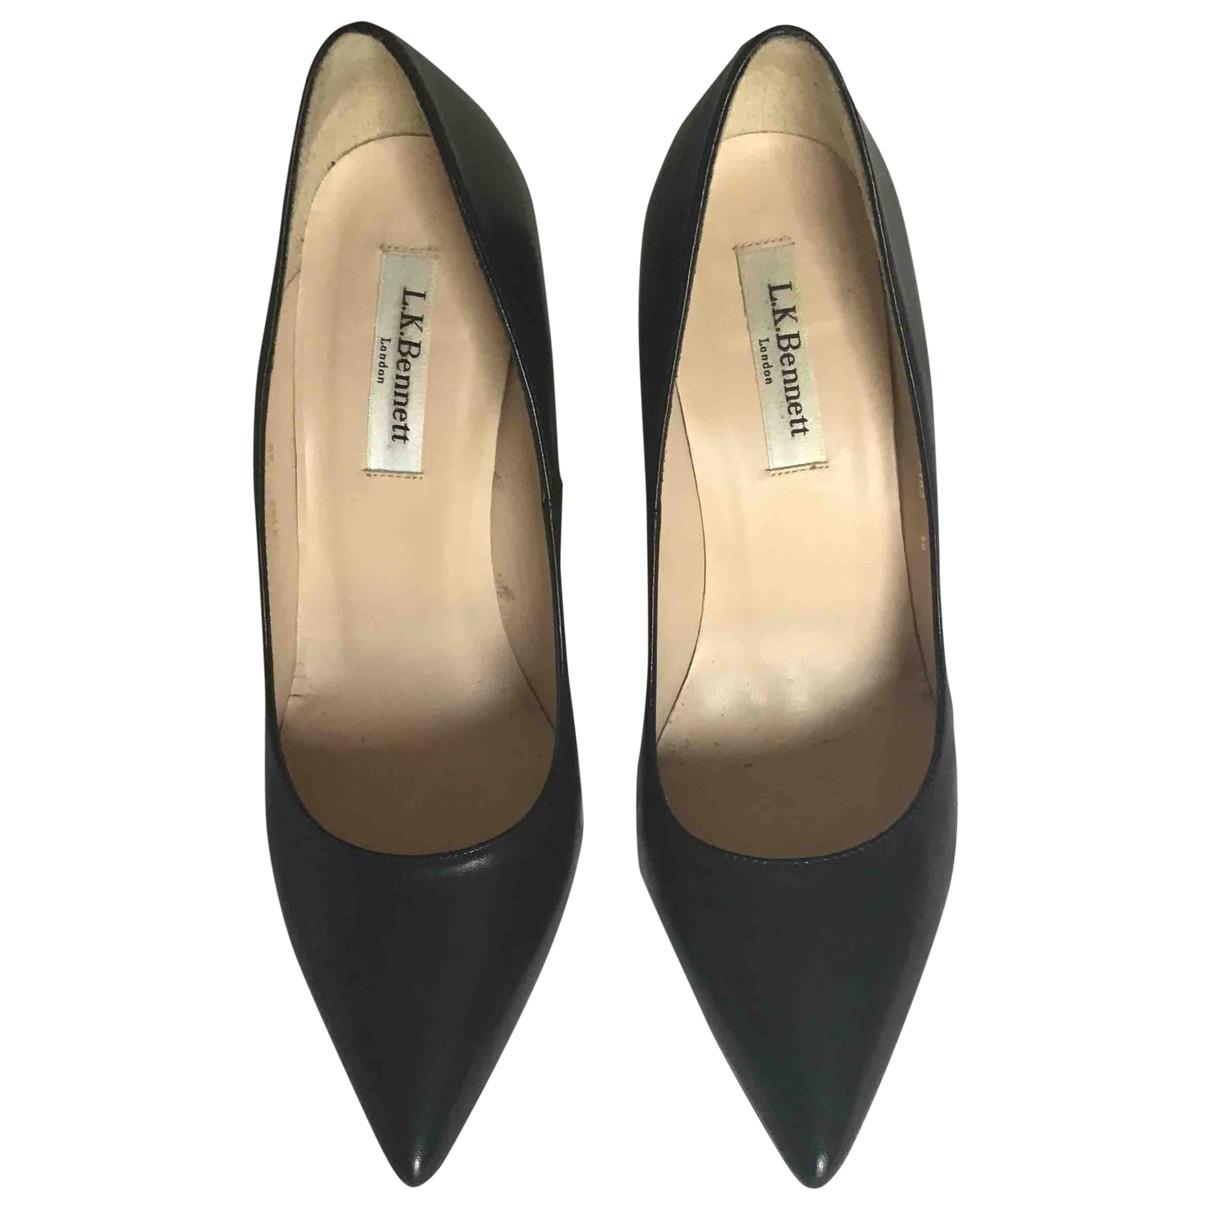 Lk Bennett \N Black Leather Heels for Women 38 EU